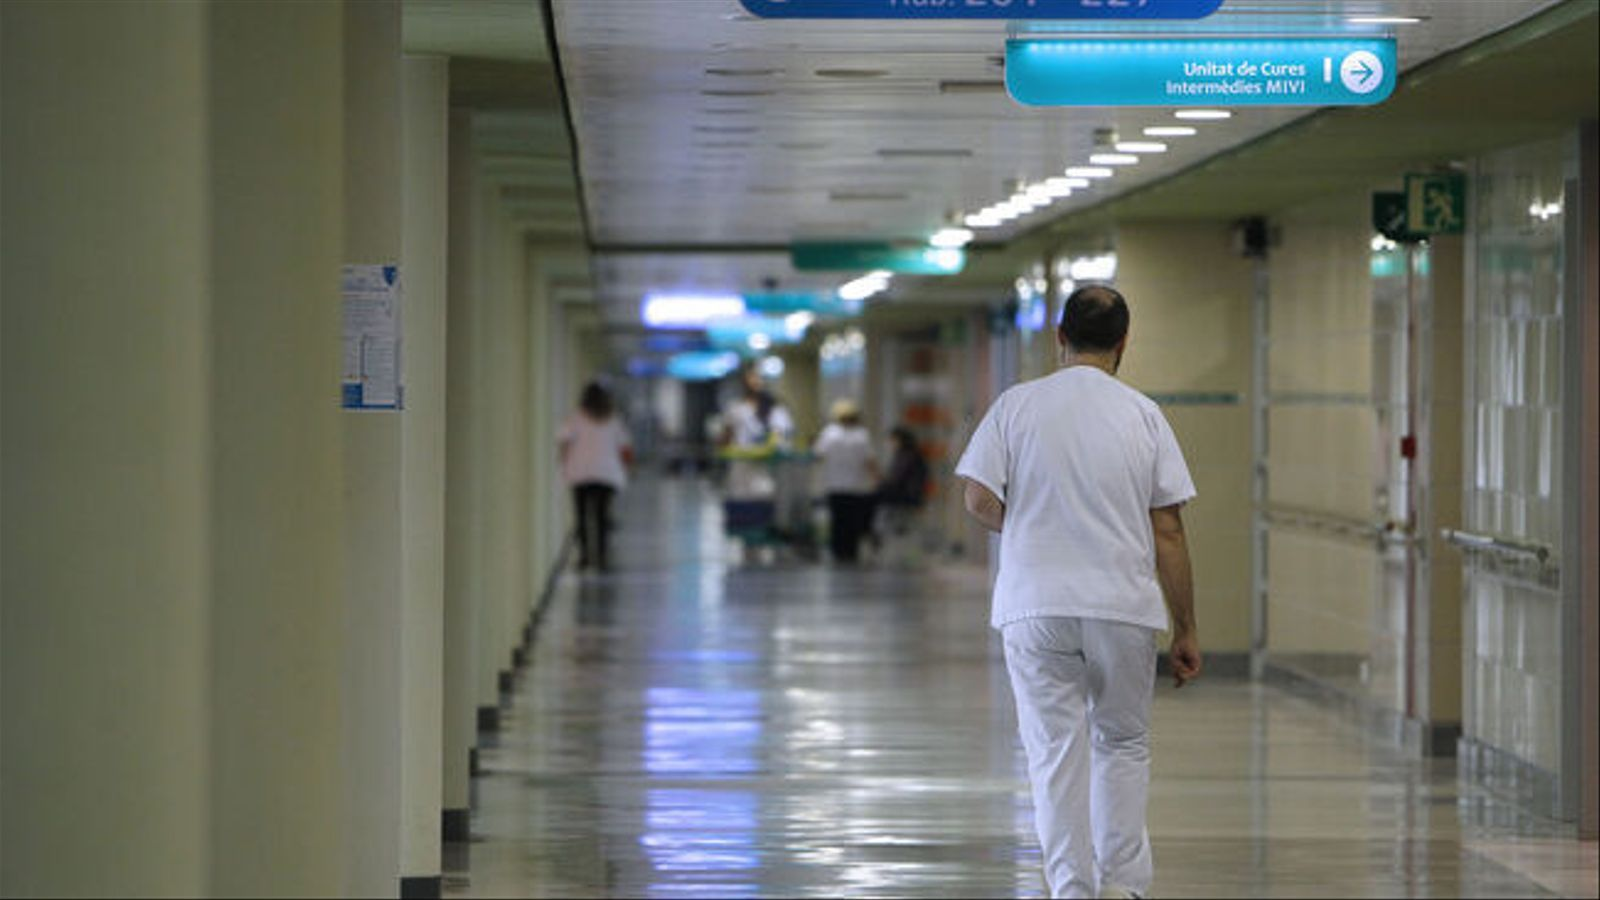 Sanitari a l'hospital Son Espases. / ISAAC BUJ